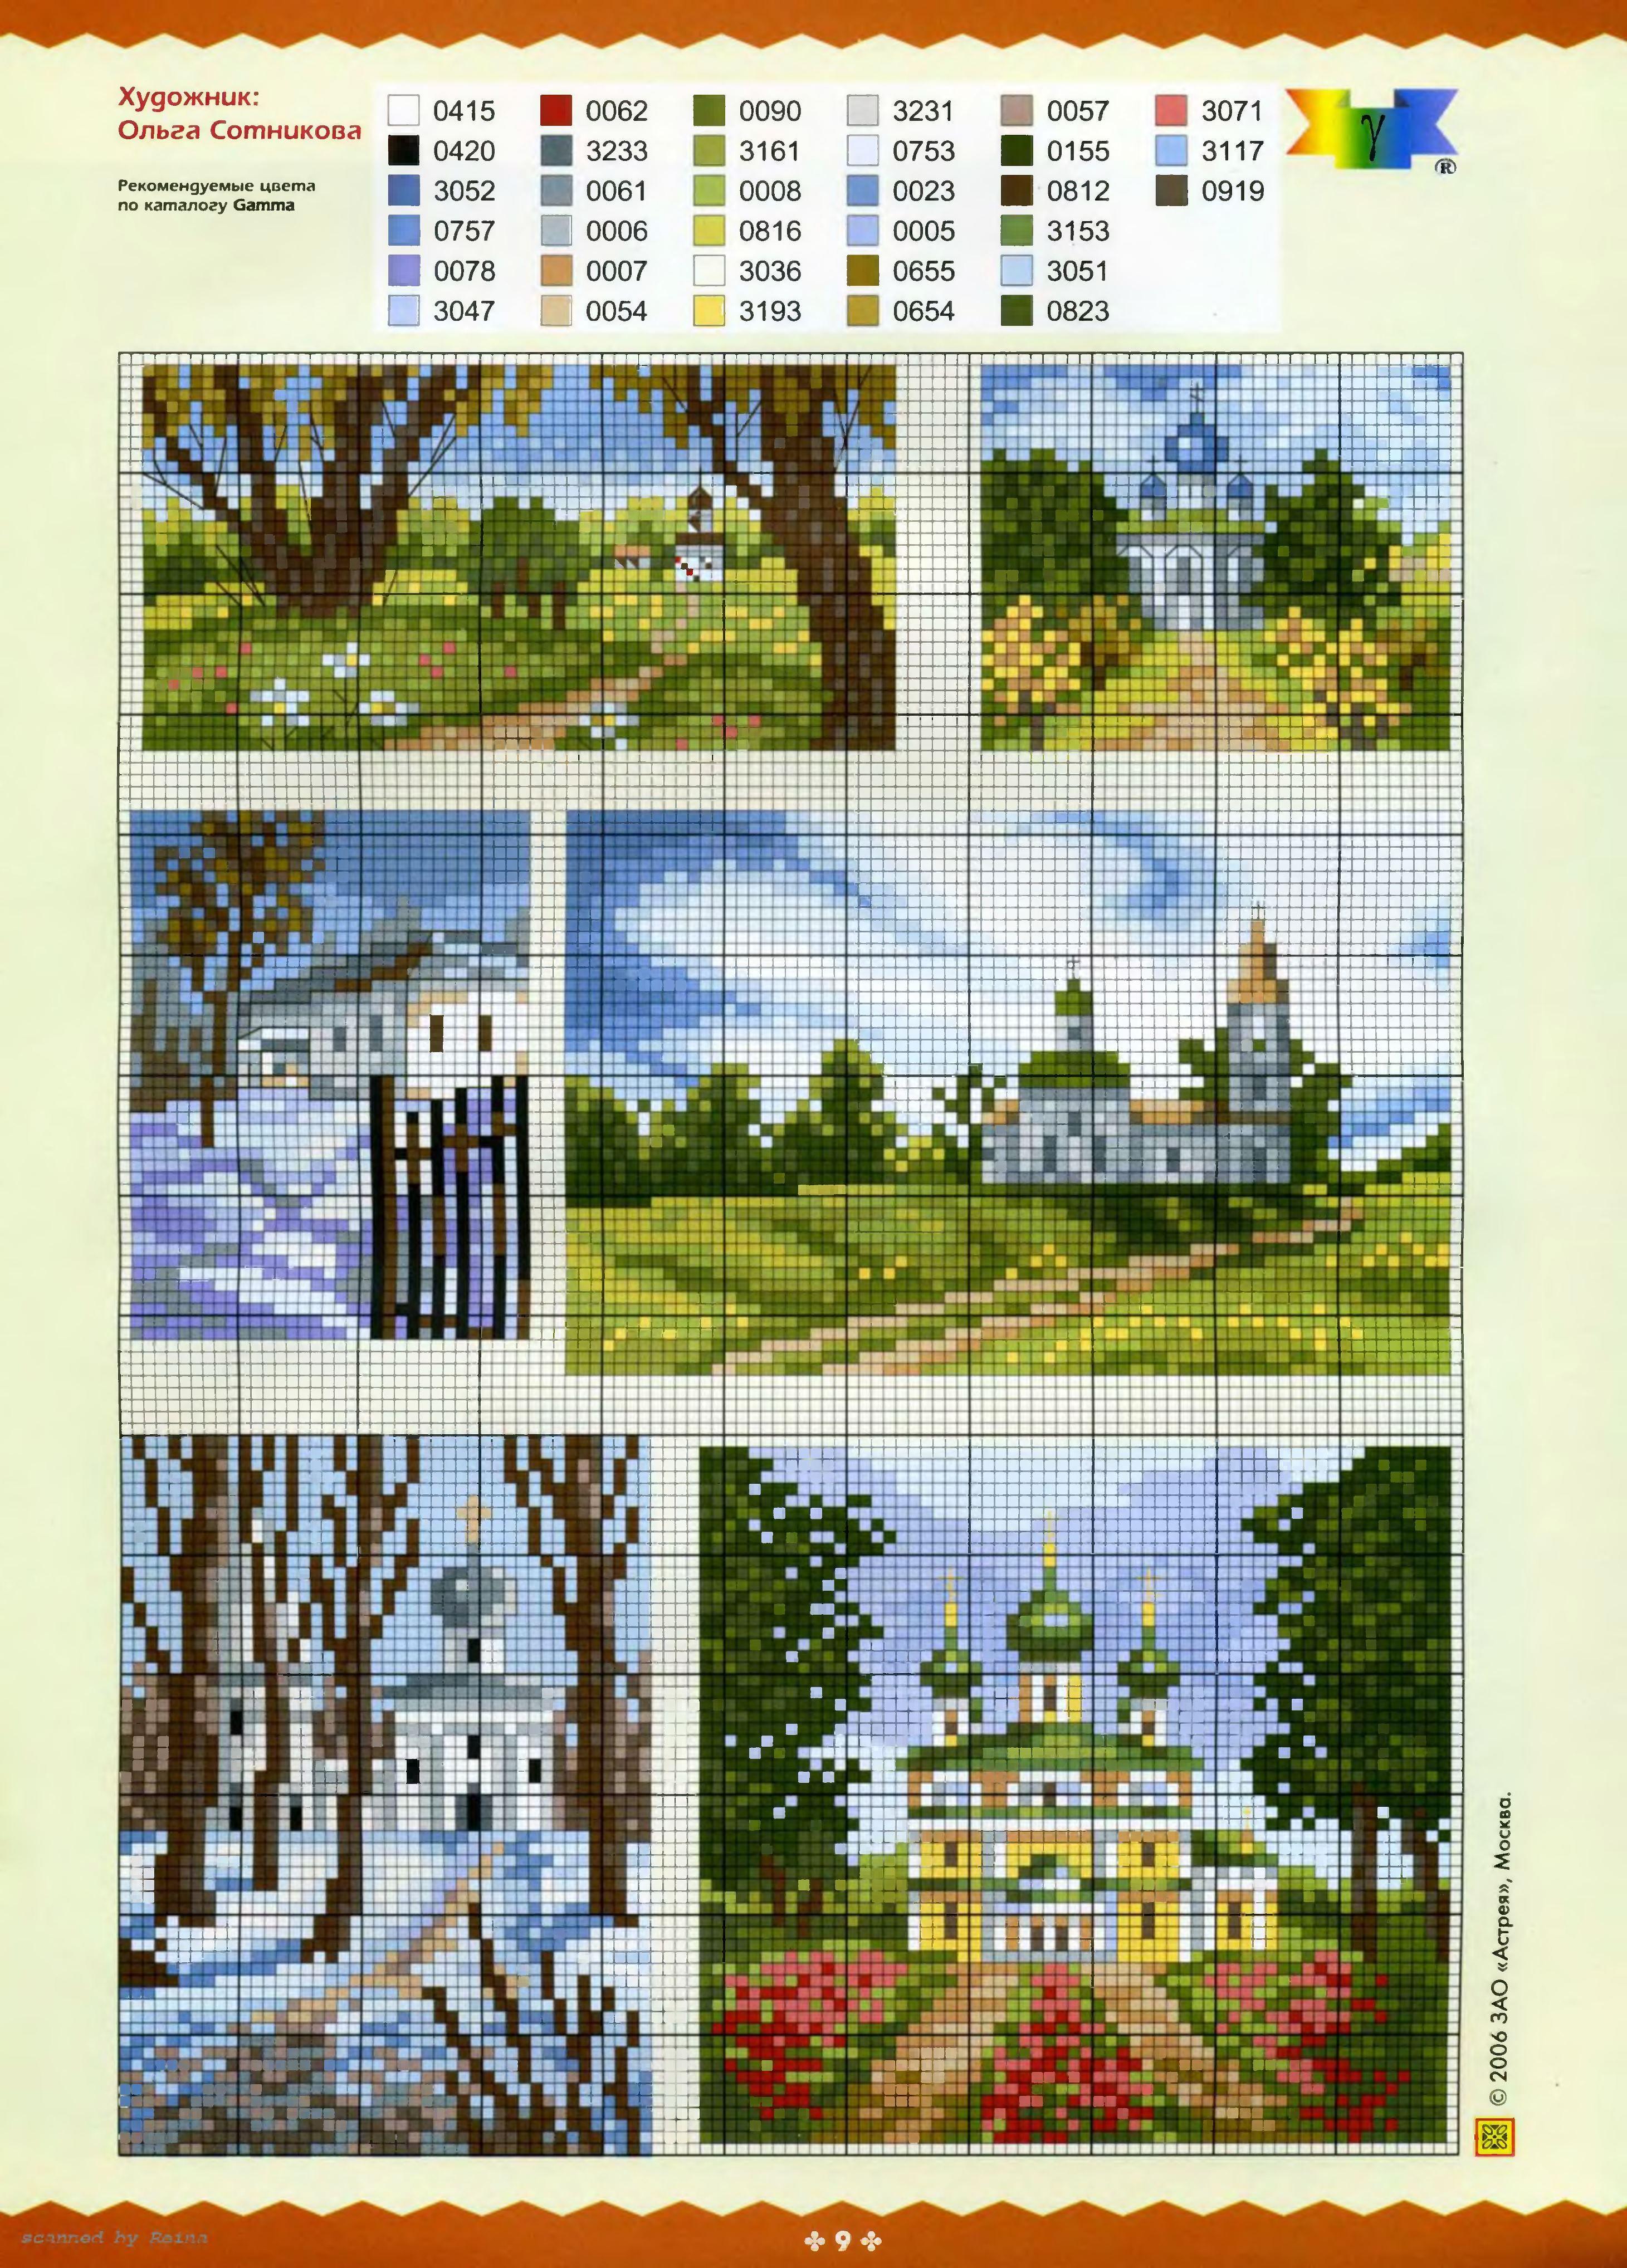 tymannost.gallery.ru watch?ph=bySI-eGcP2&subpanel=zoom&zoom=8 ...